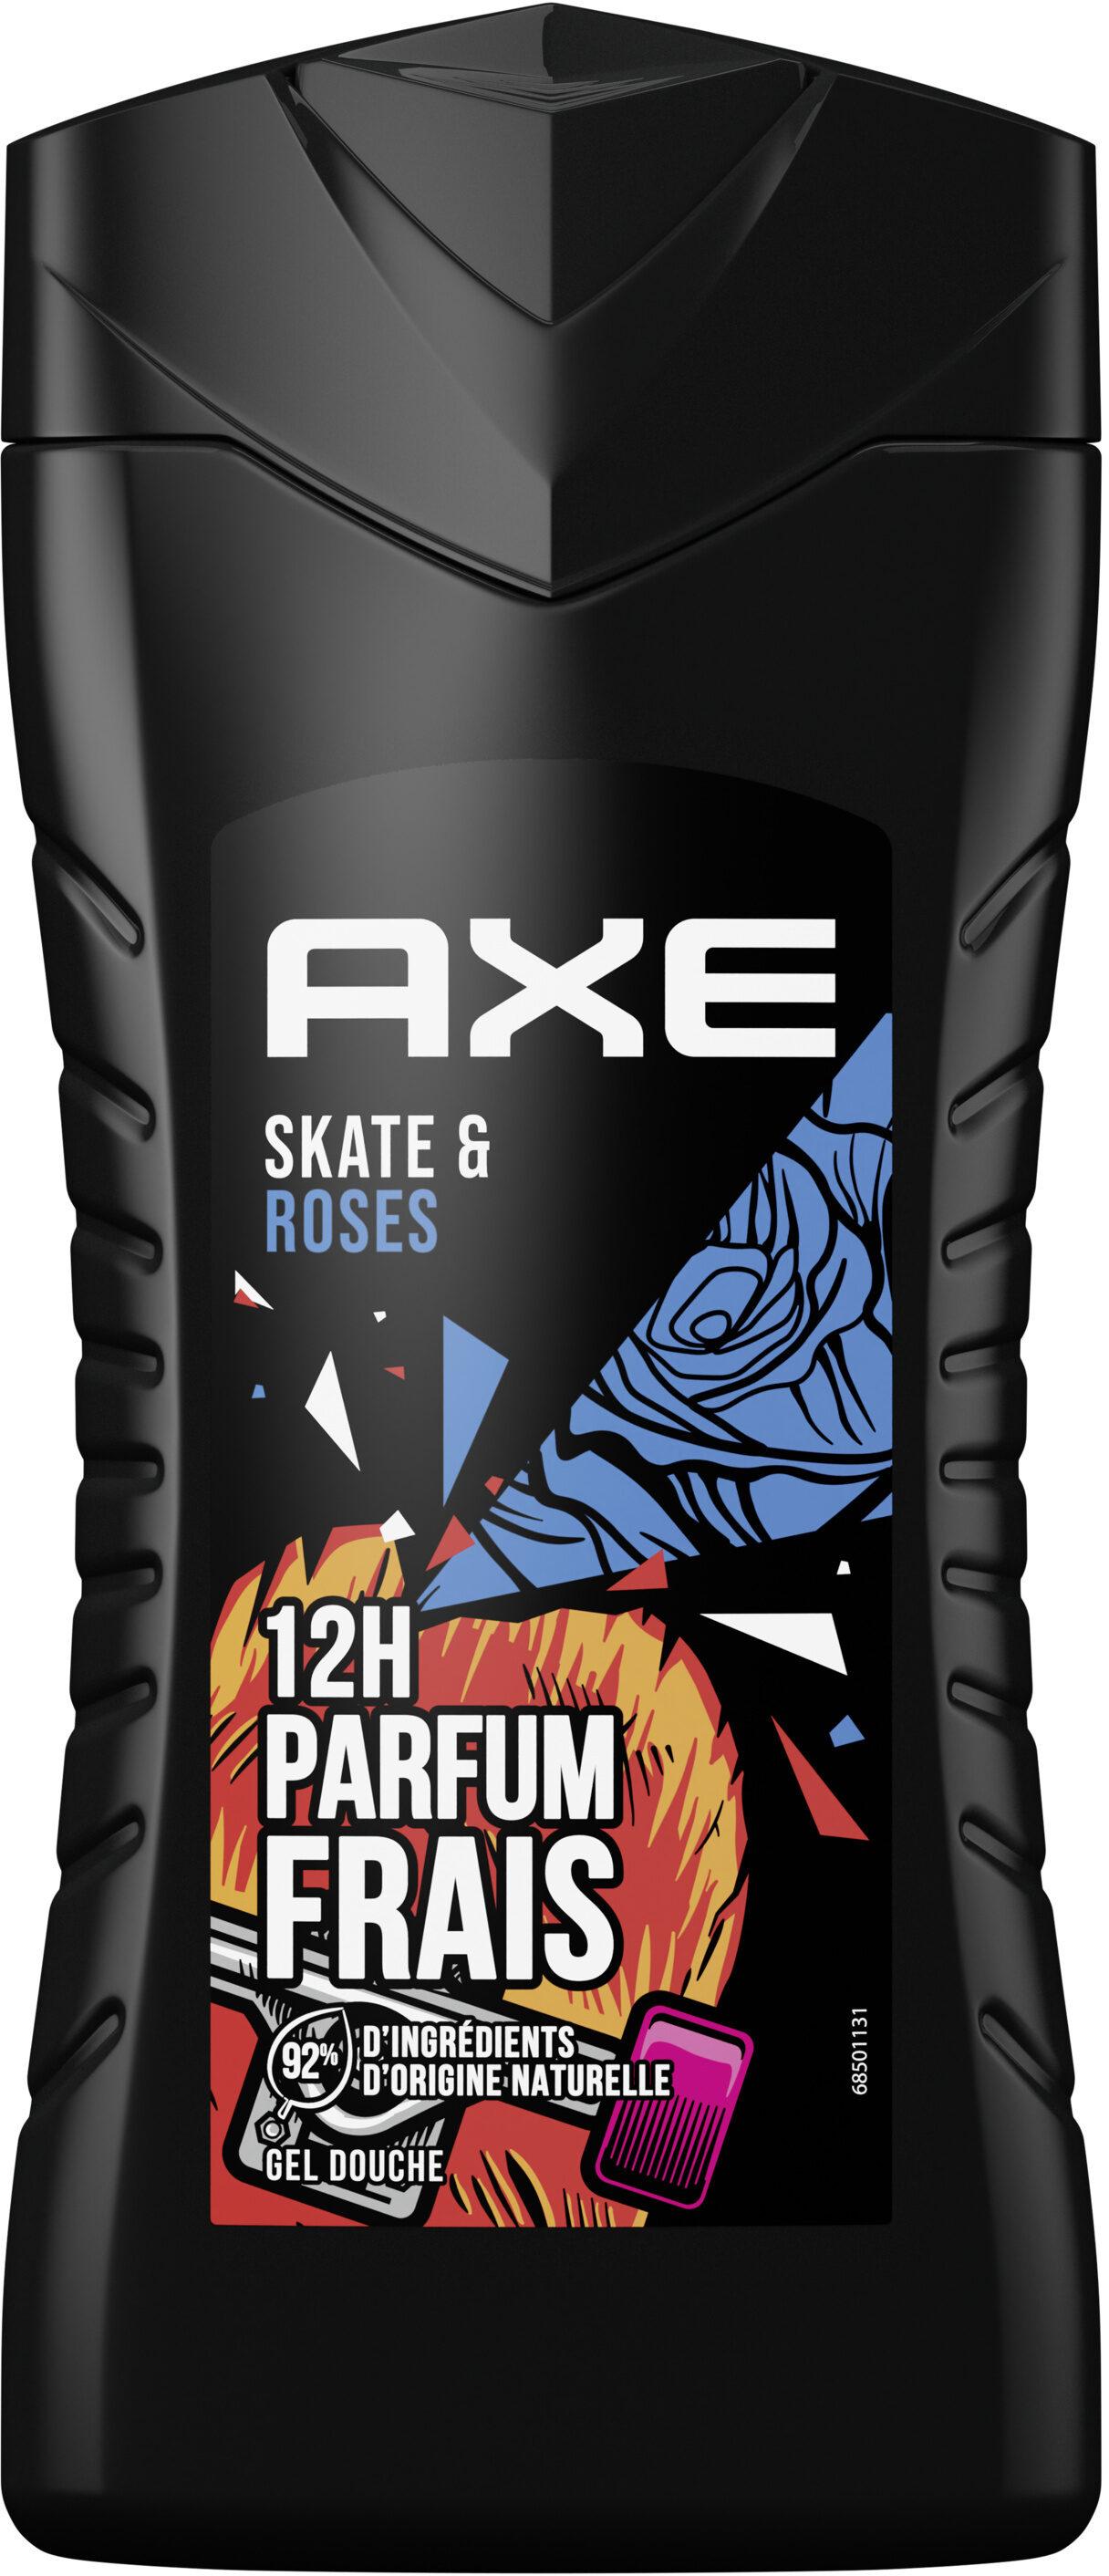 AXE Gel Douche Homme Skate & Roses 12h Parfum Frais - Produit - fr